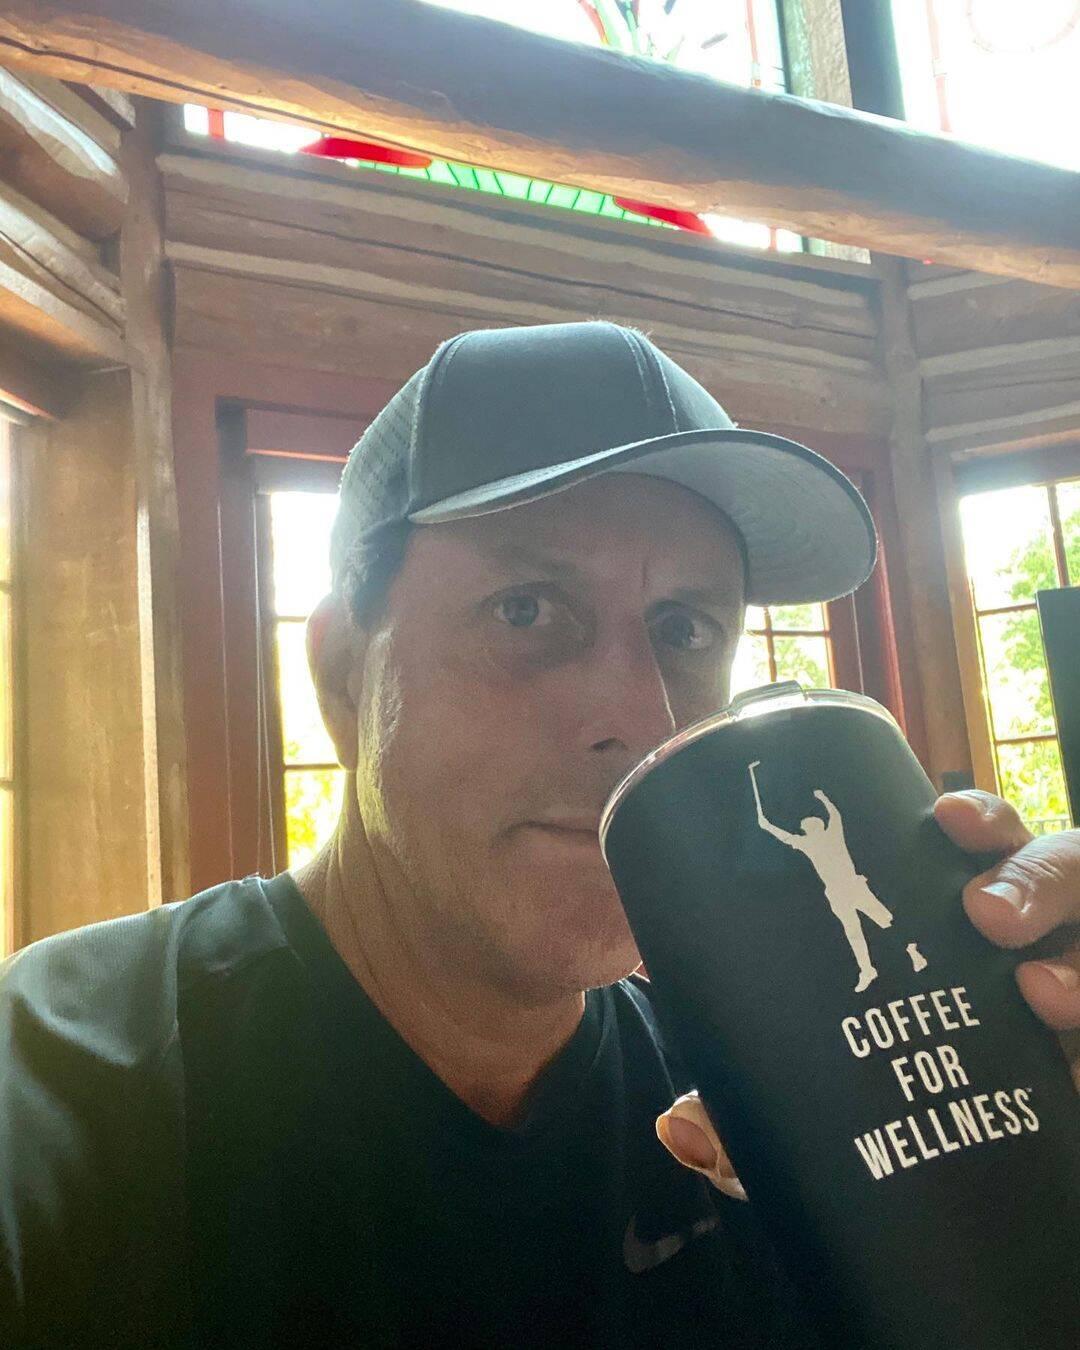 Phil Mickelson do golfe recebeu US$ 41 milhões (Foto: Instagram)